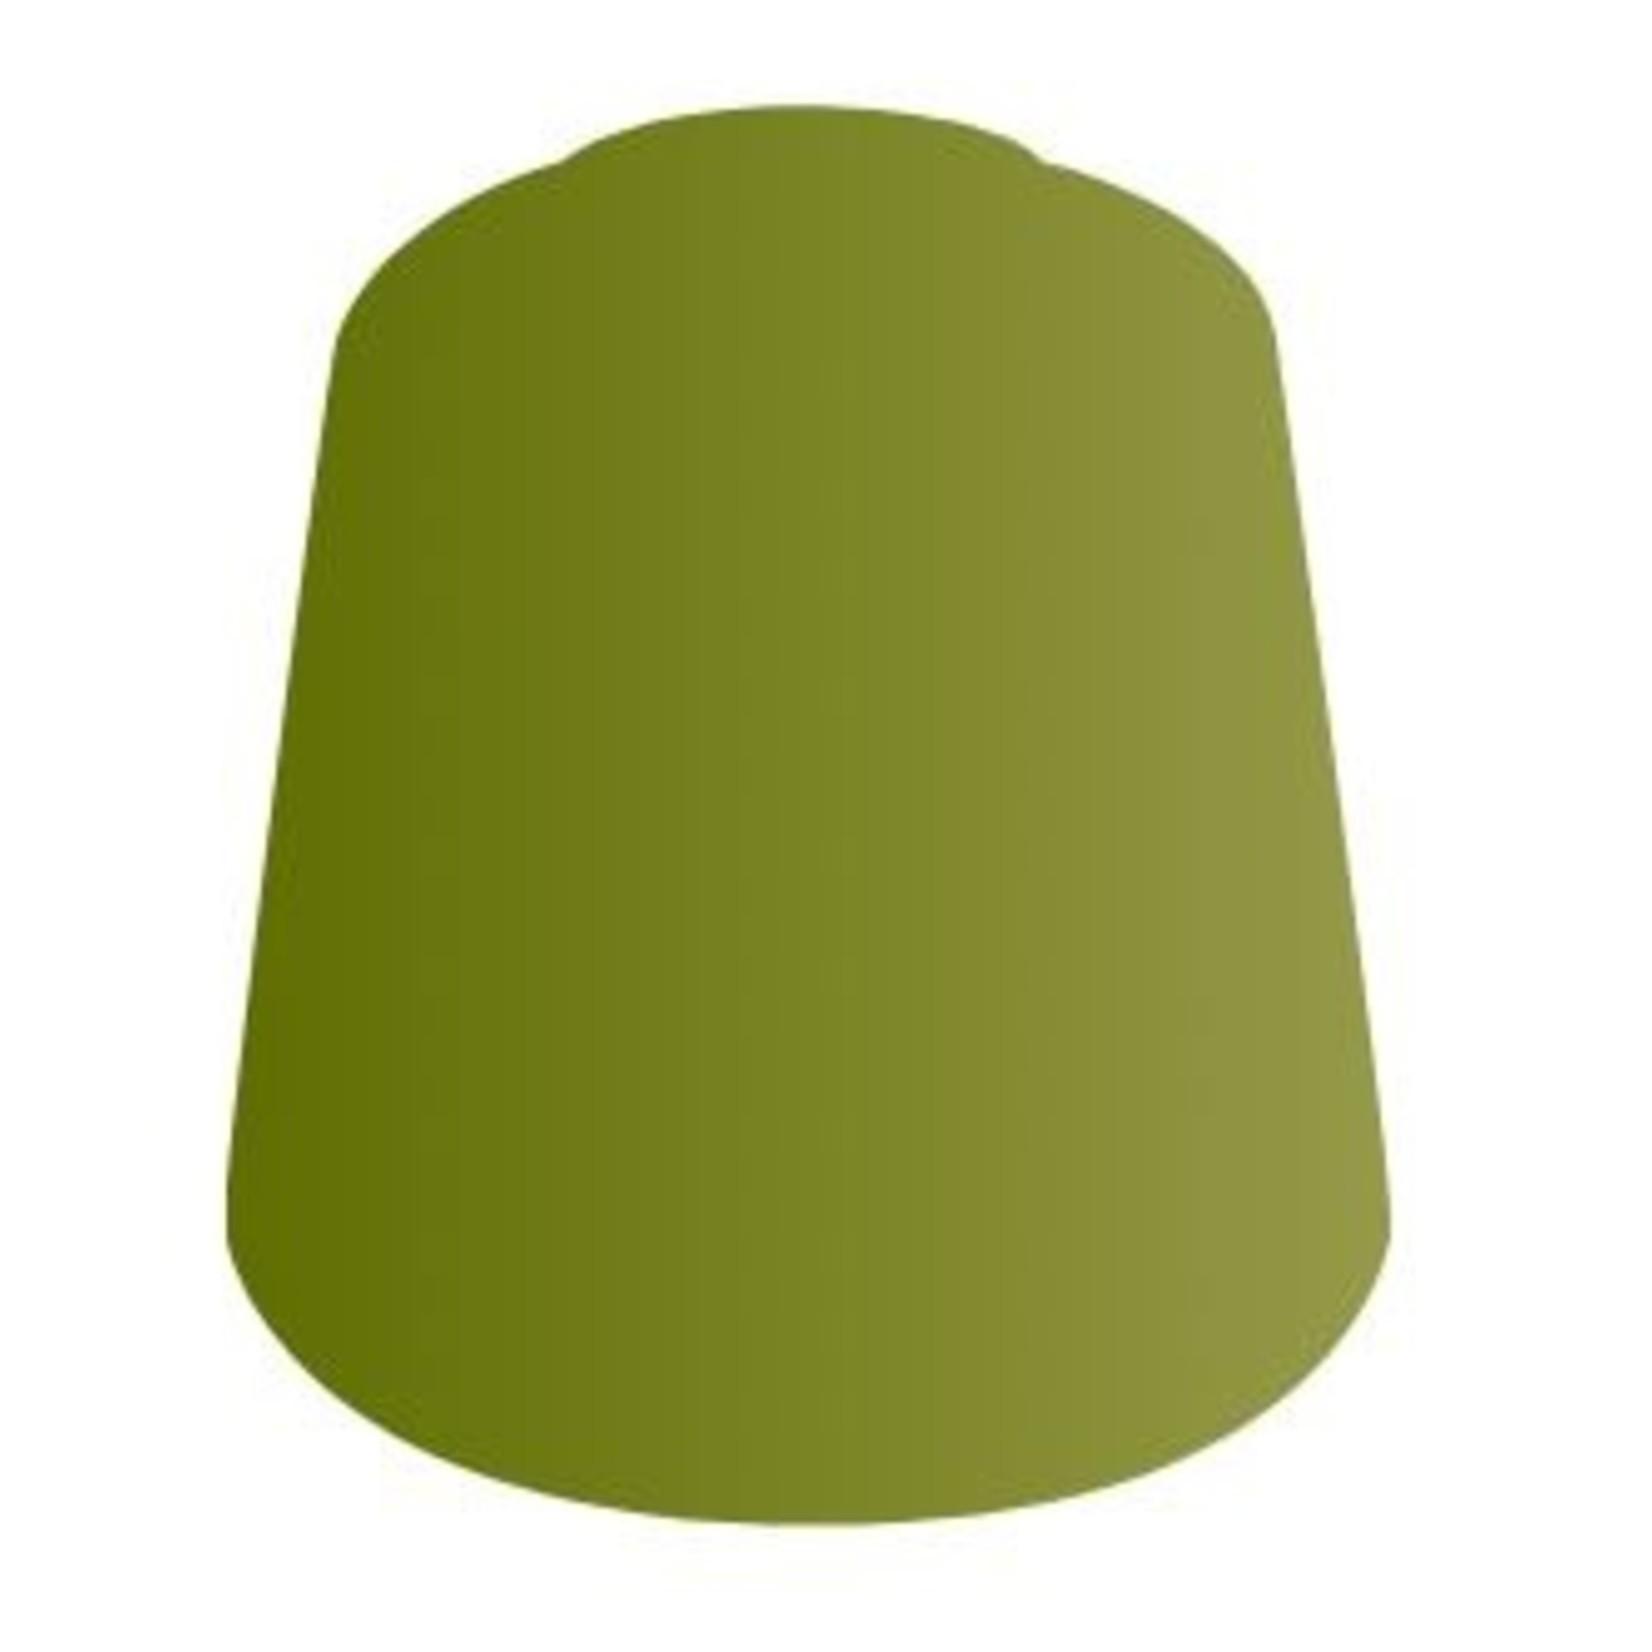 Games Workshop Militarum Green (18ml) Contrast